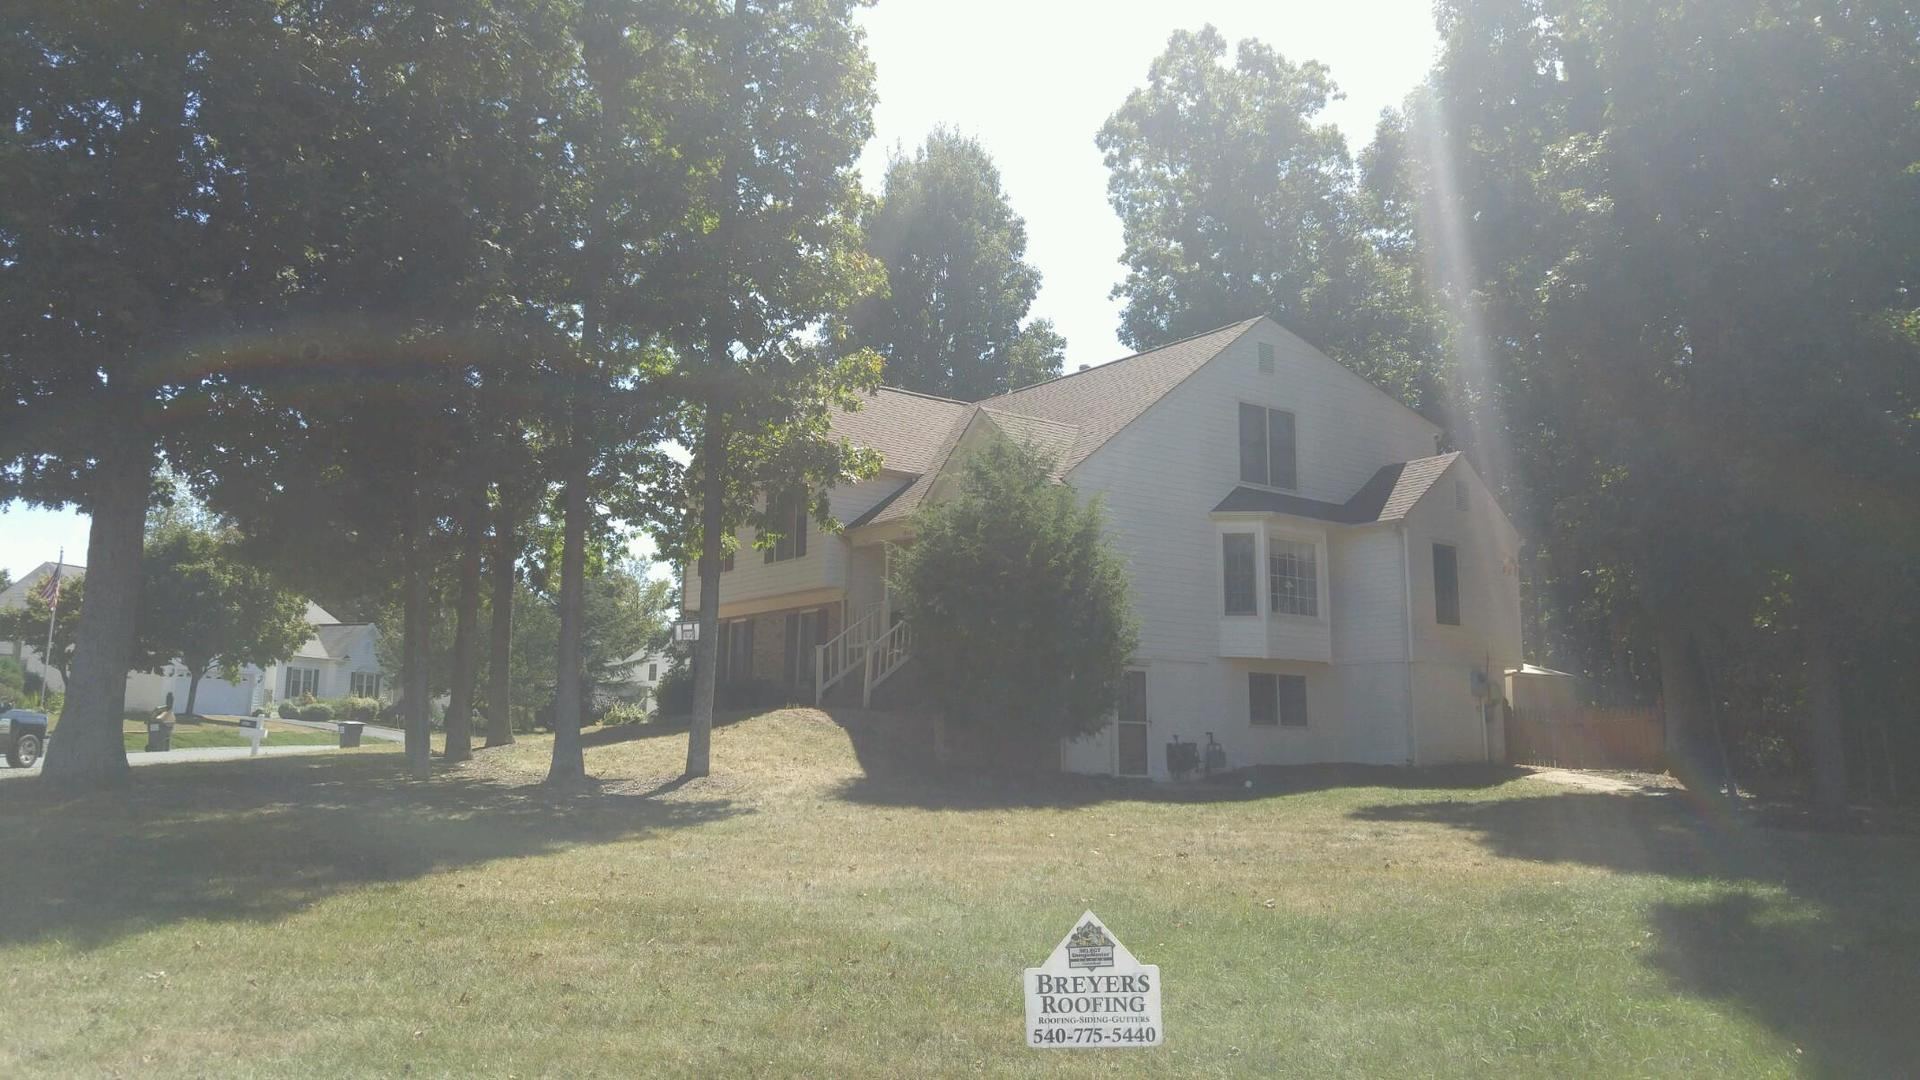 Breyer's Roofing image 0